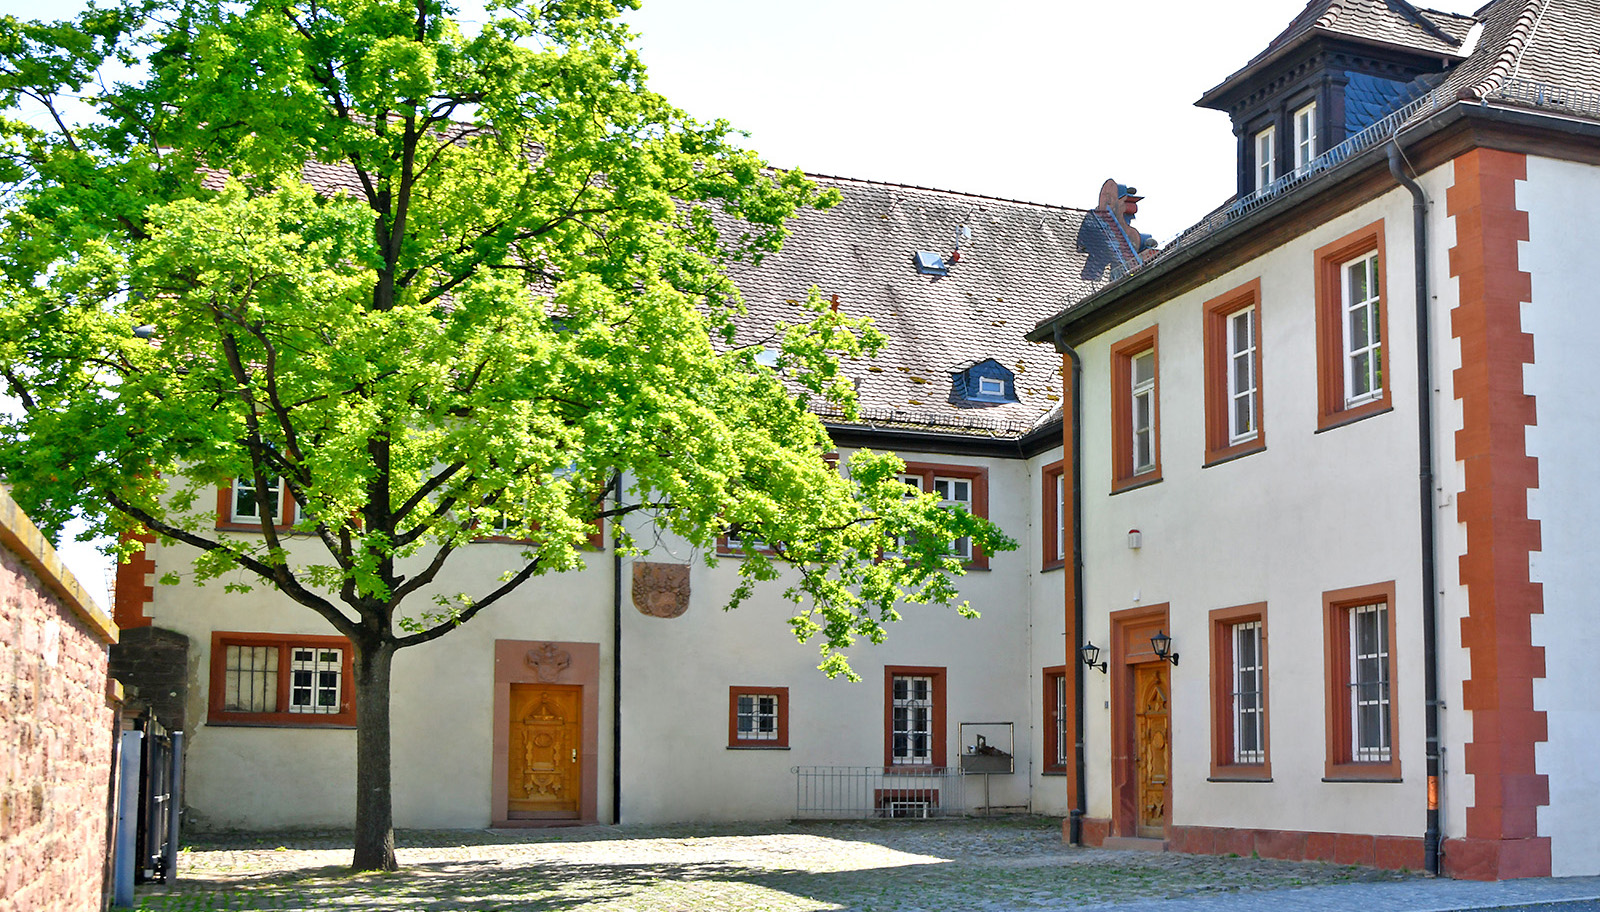 Altes Forsthaus 1600 Breite.jpg